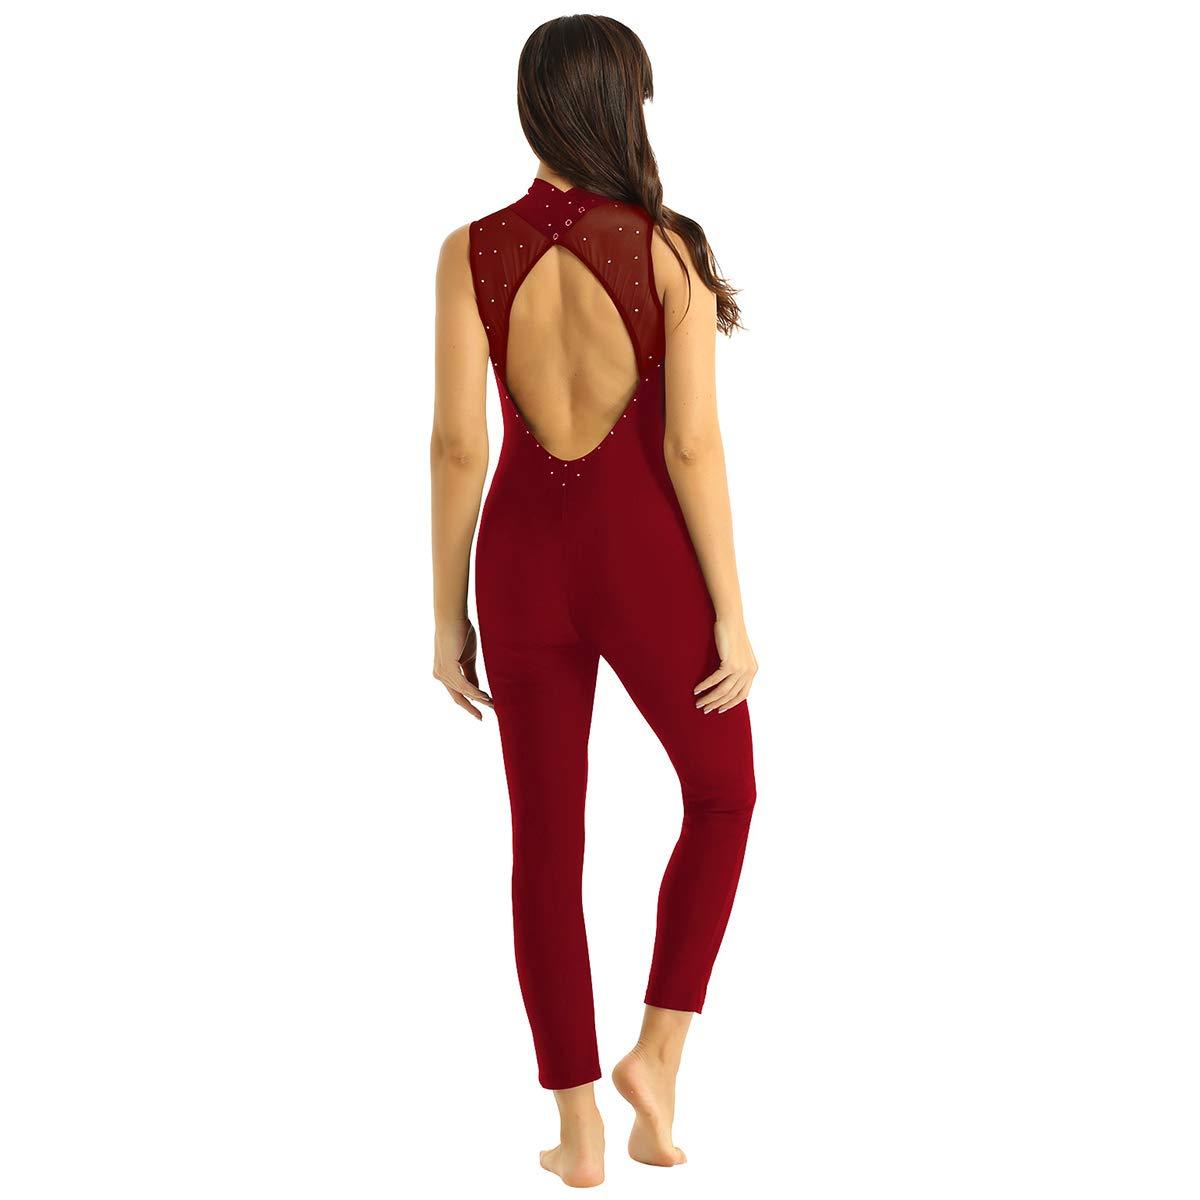 inhzoy Maillot de Danza Ballet Cuero para Mujer Mono Deportivo de Gimnasia R/ítmica Sin Mangas Leotardo de Patinaje Yoga Fitness Ropa Deporte